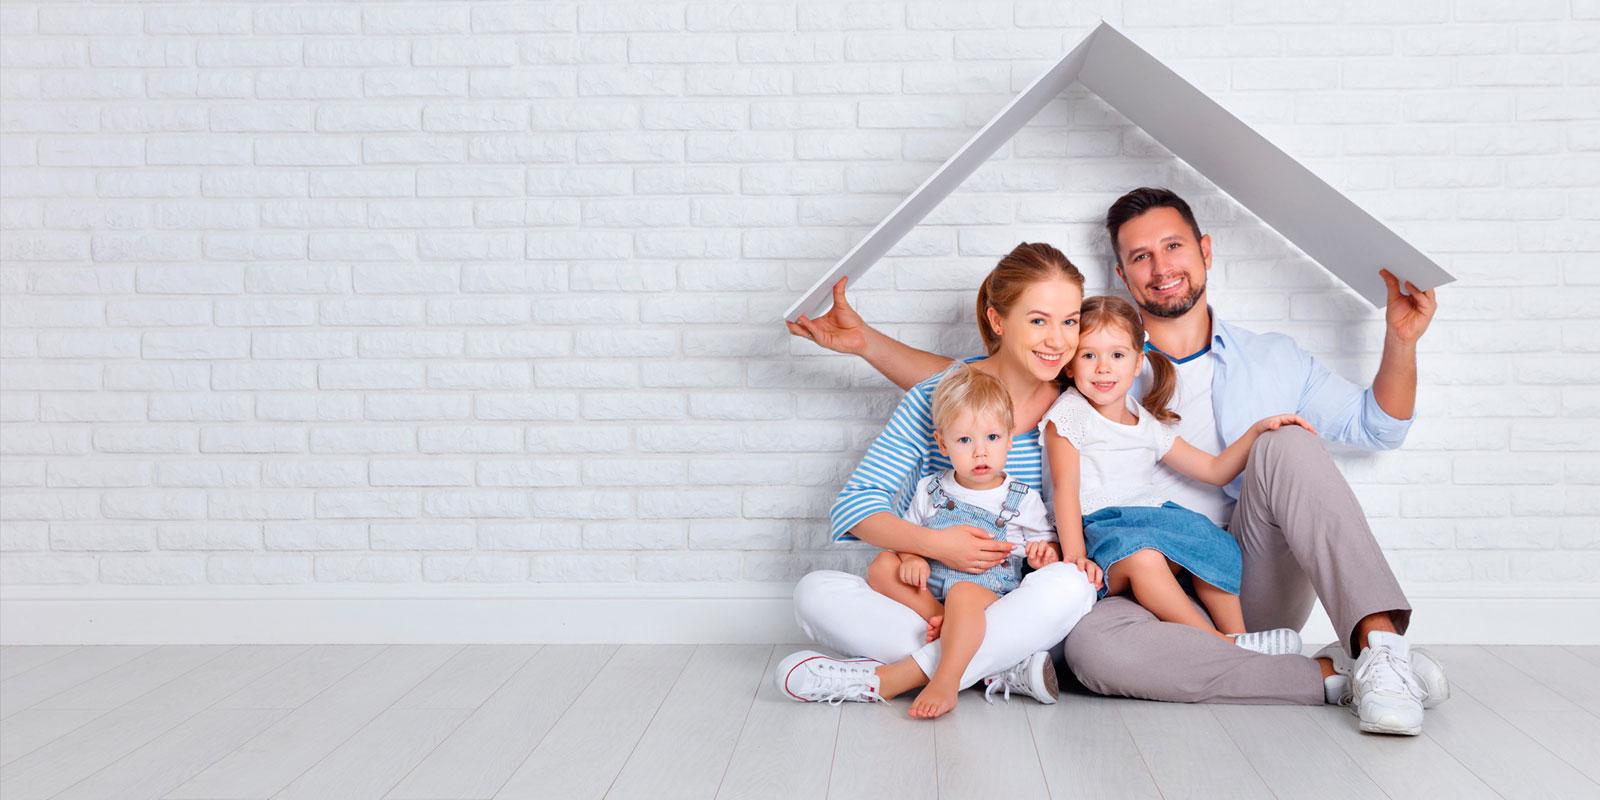 Gestión hipotecaria - Brokers hipotecarios - Global Finance